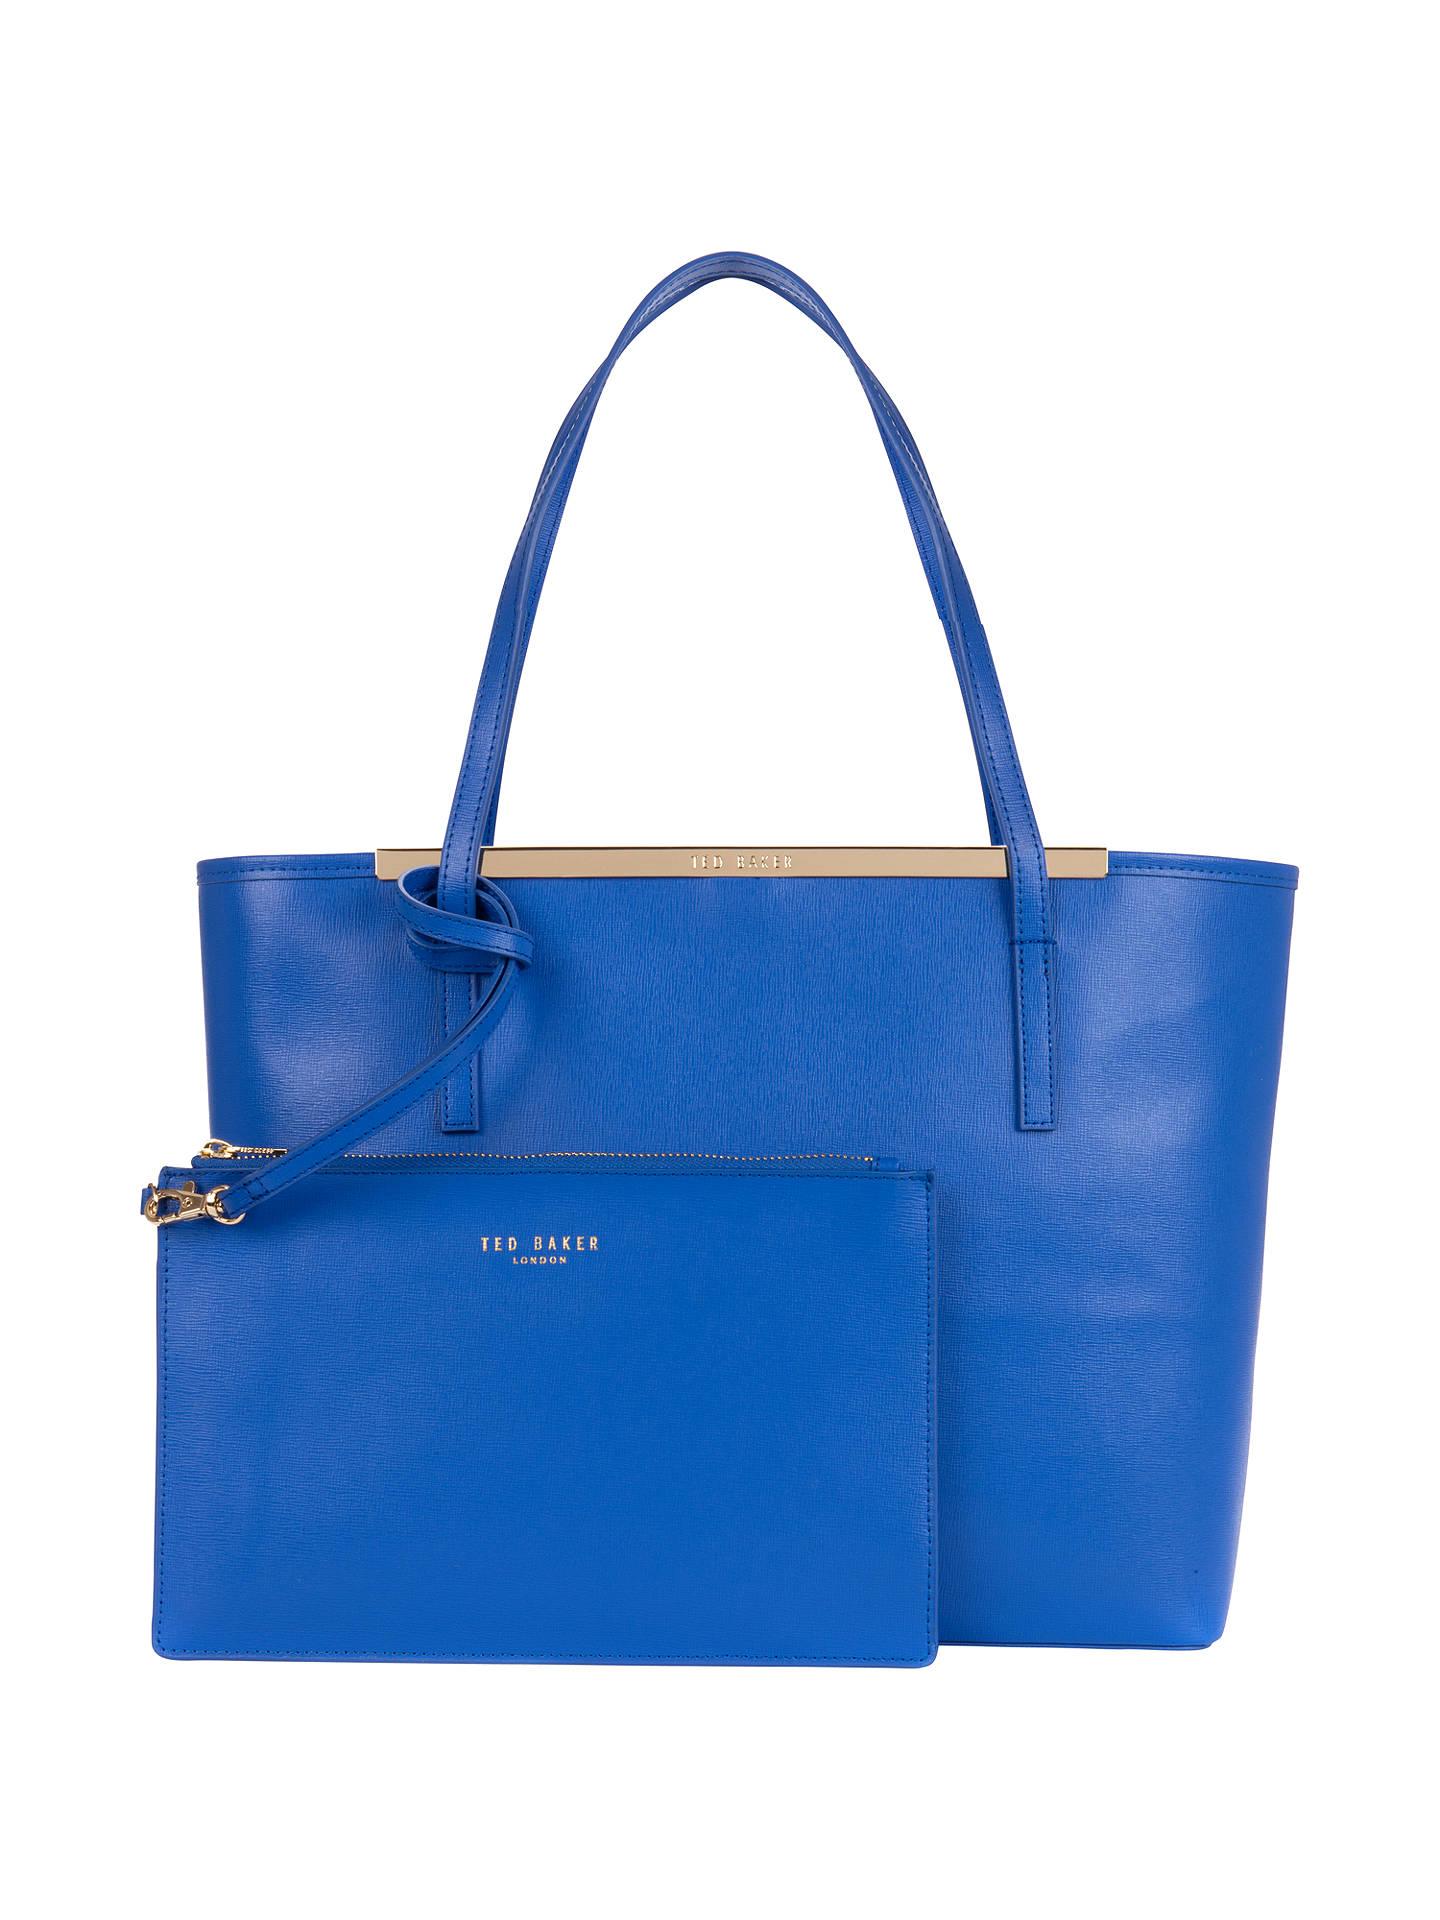 748443d39d12e Ted Baker Isbell Leather Crosshatch Shopper Bag at John Lewis   Partners